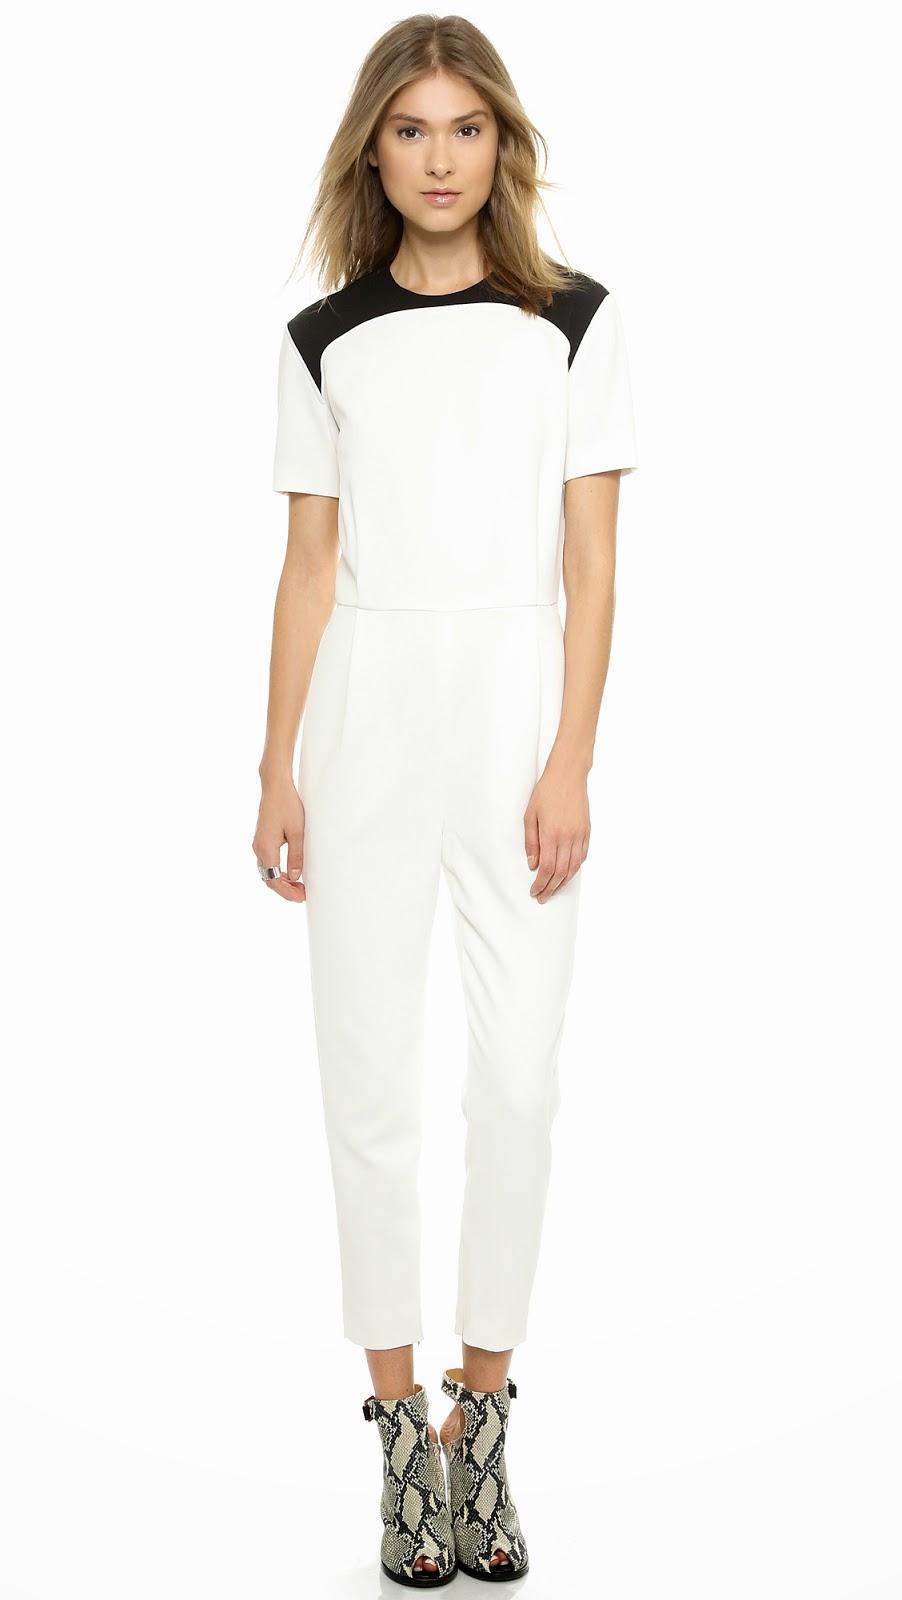 Modest jumpsuit with sleeves | Follow Mode-sty for stylish modest clothing tznius orthodox jewish muslim hijab mormon lds pentecostal islamic evangelical christian